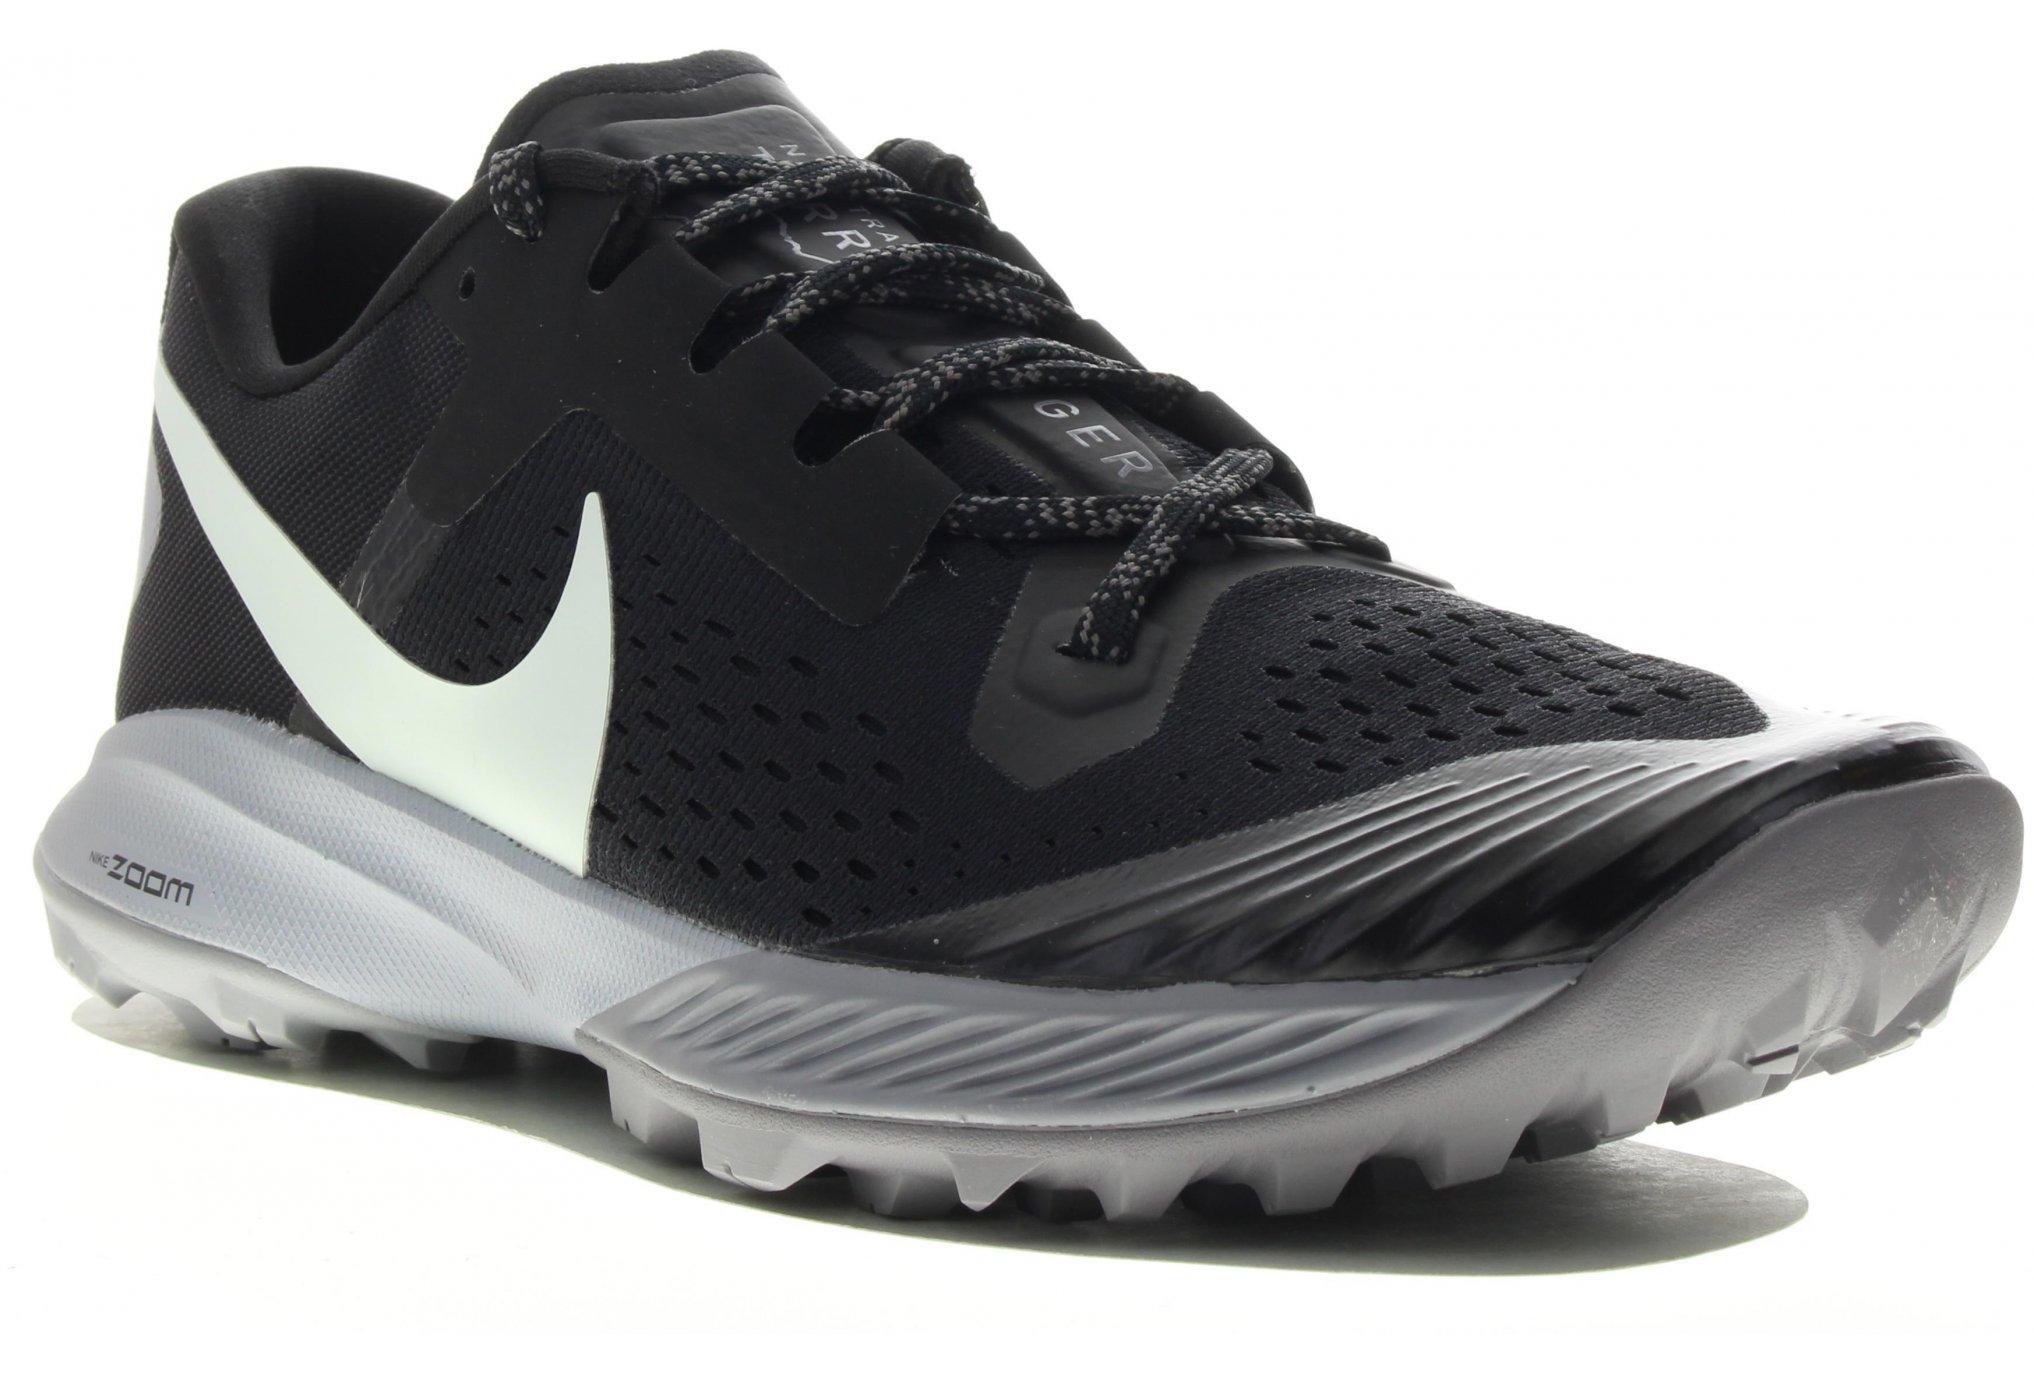 Nike Air Zoom Terra Kiger 5 Chaussures homme